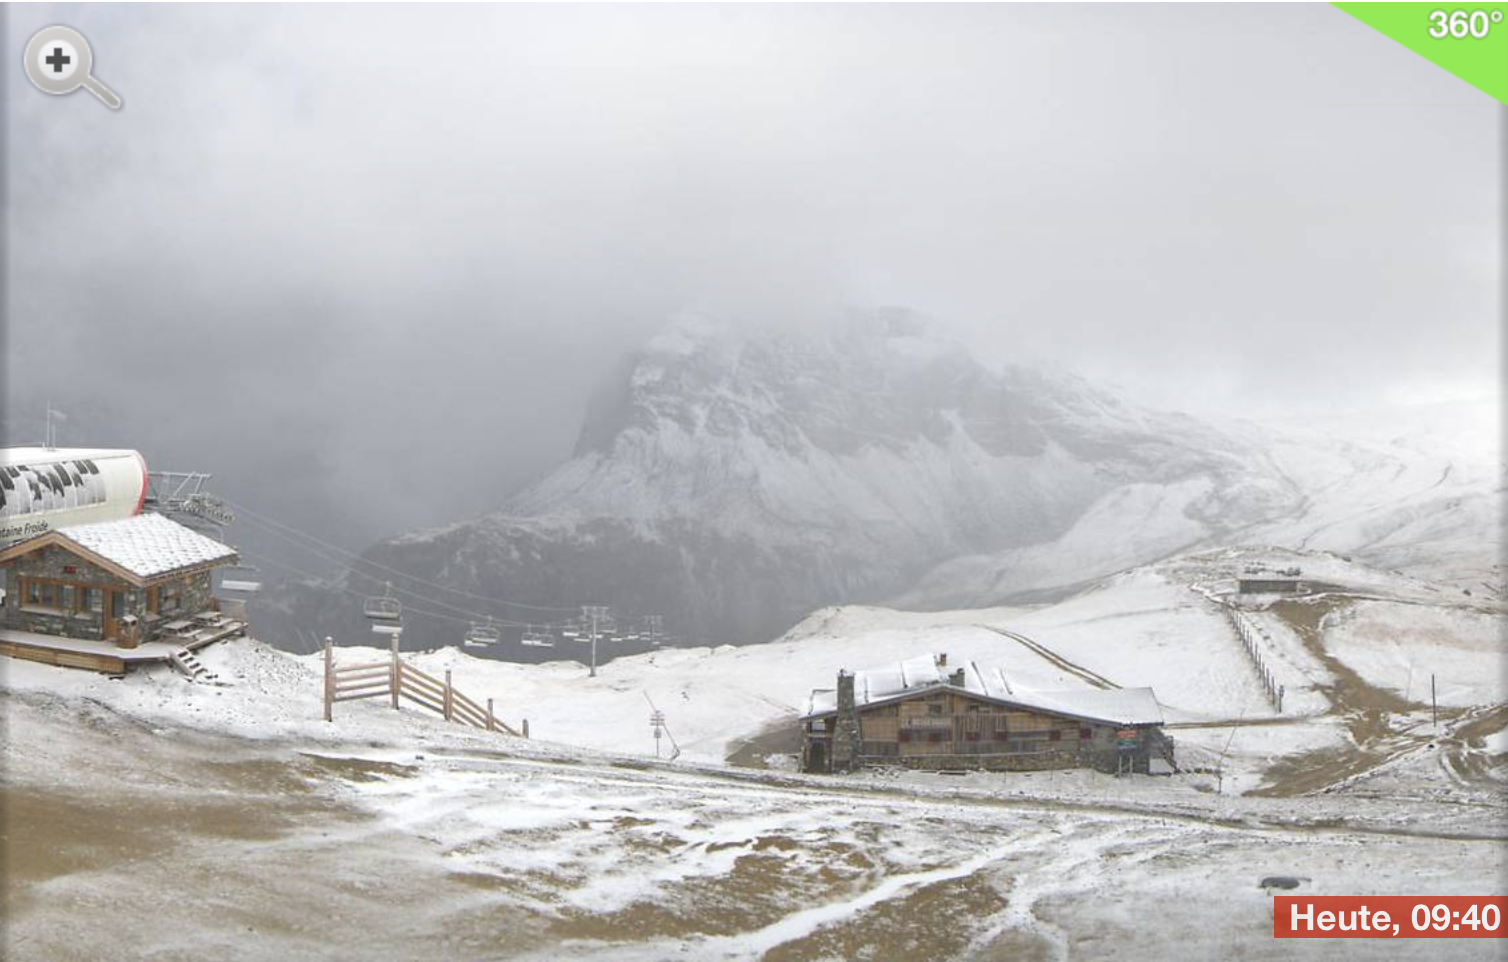 First snow autumn 2017 Tignes-Val d'Isere